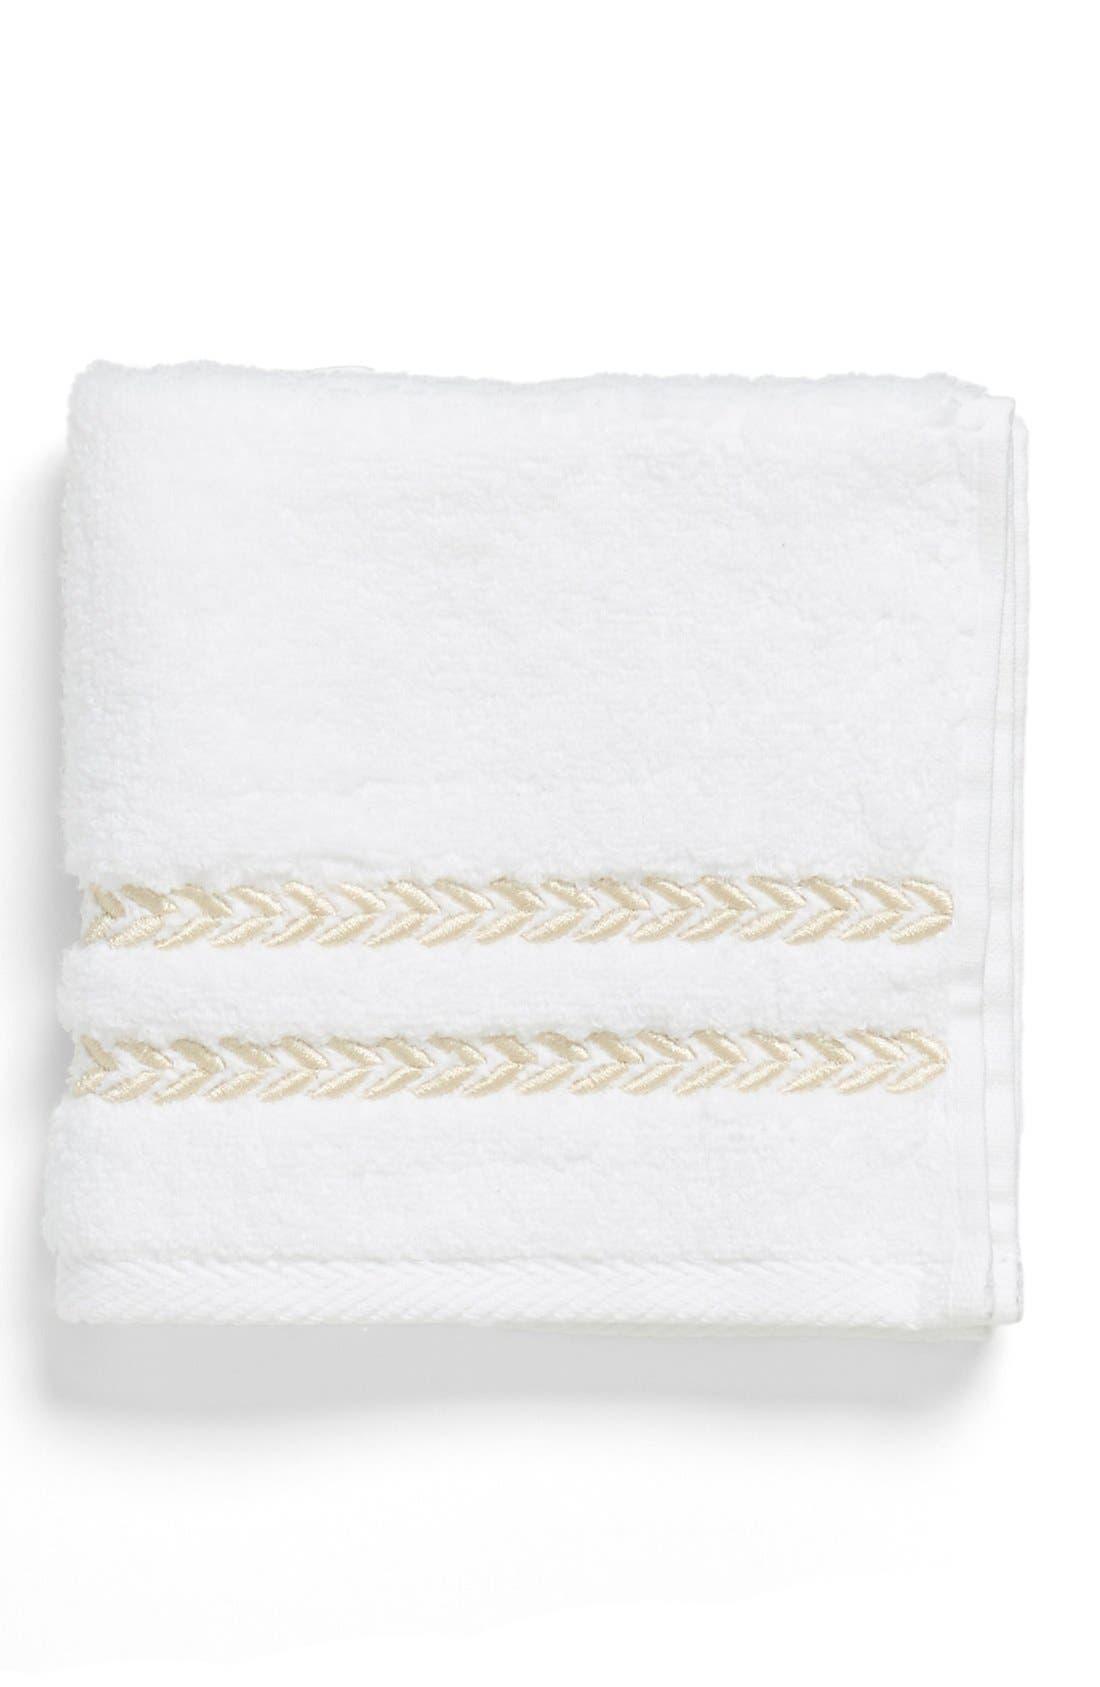 Main Image - Dena Home 'Pearl Essence' Wash Towel